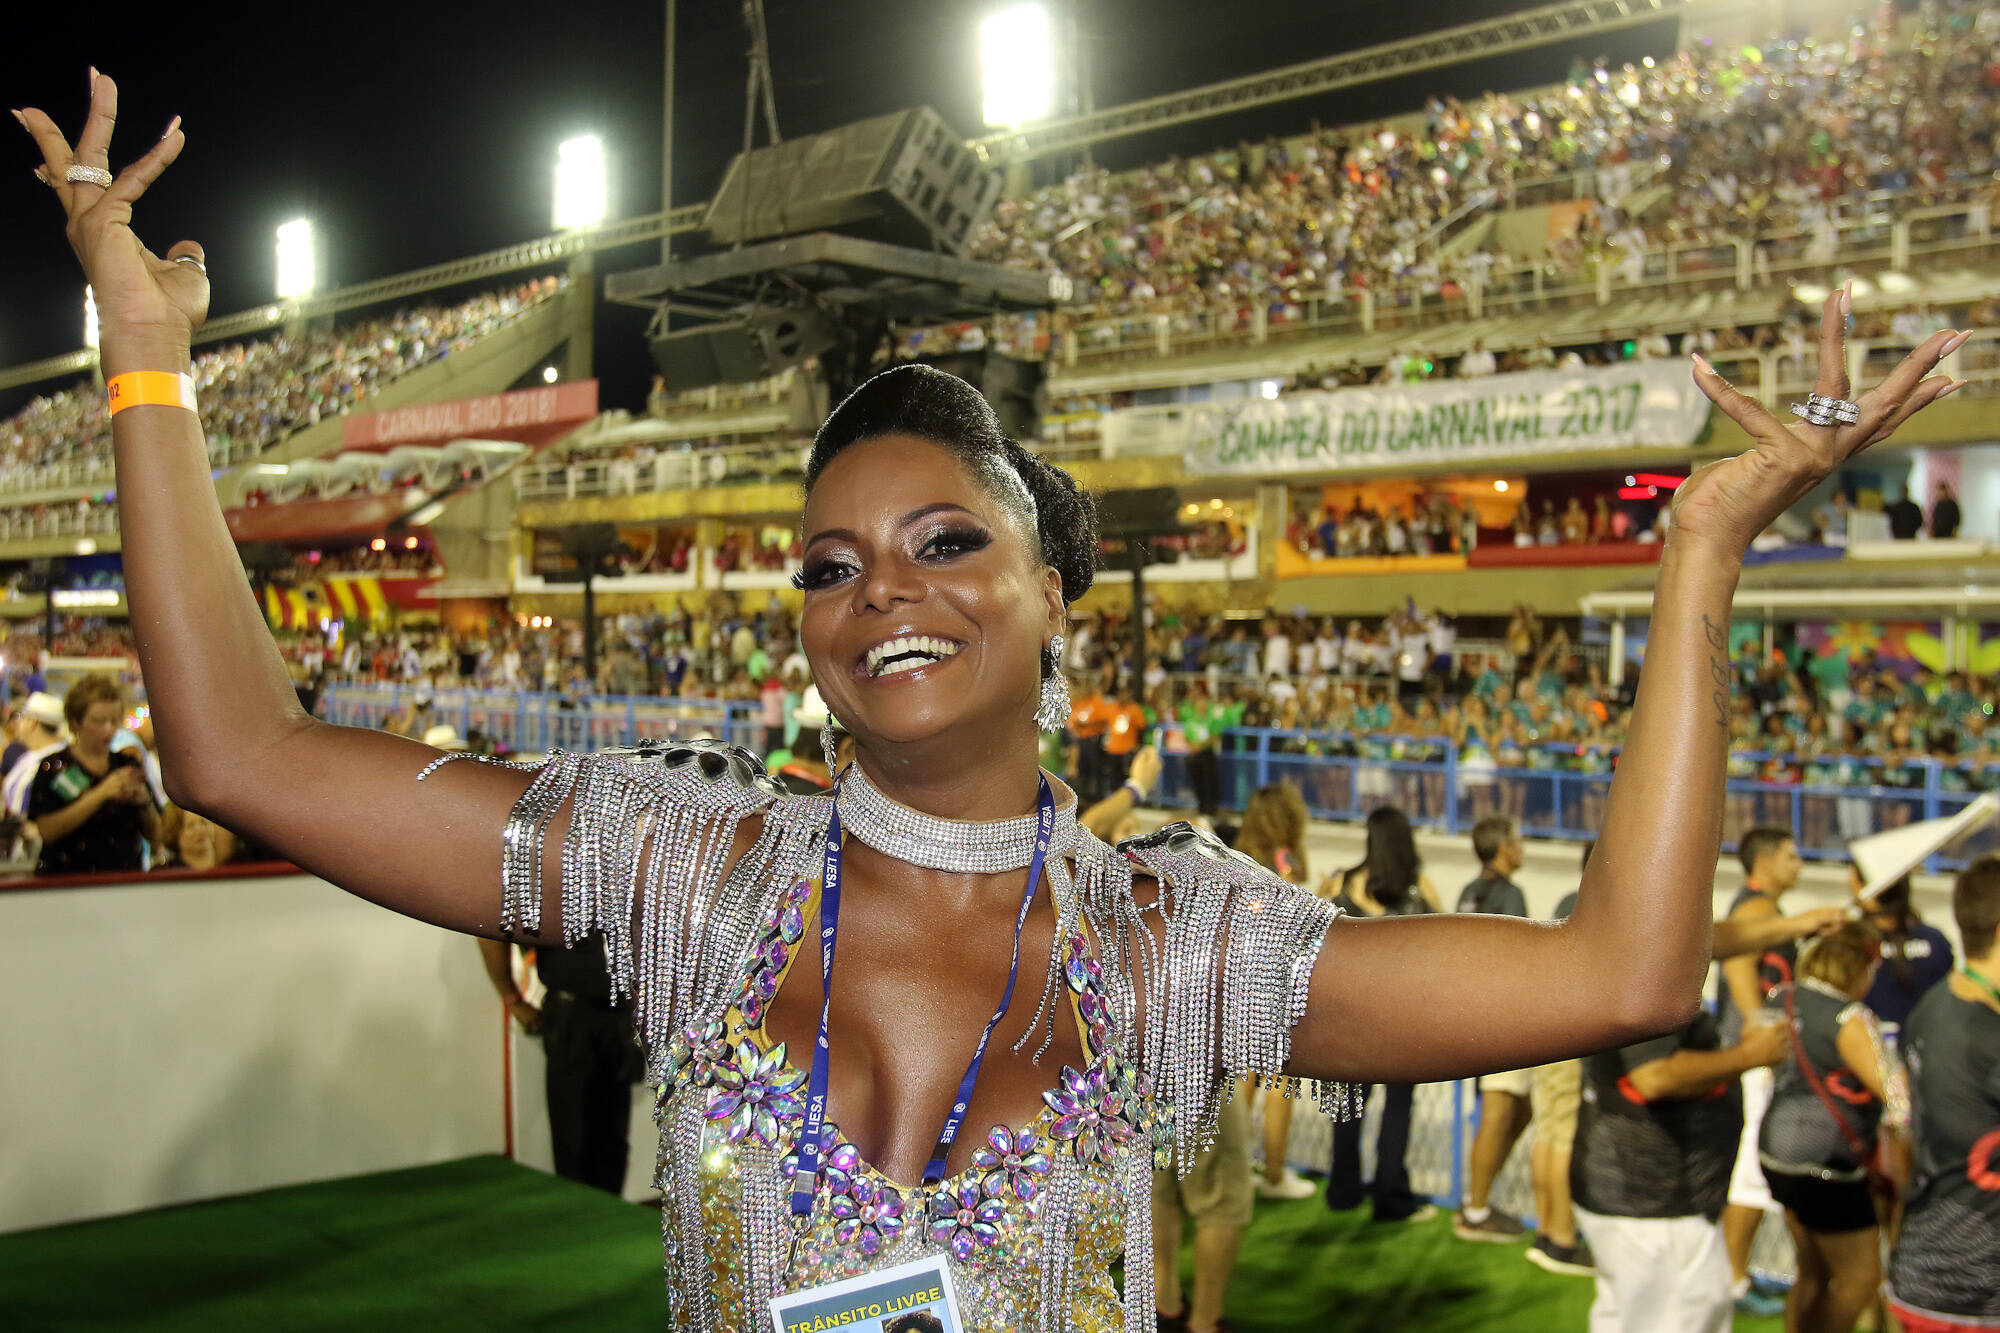 Camarote Grande Rio na última segunda-feira (12), no Rio. Foto: eny miranda